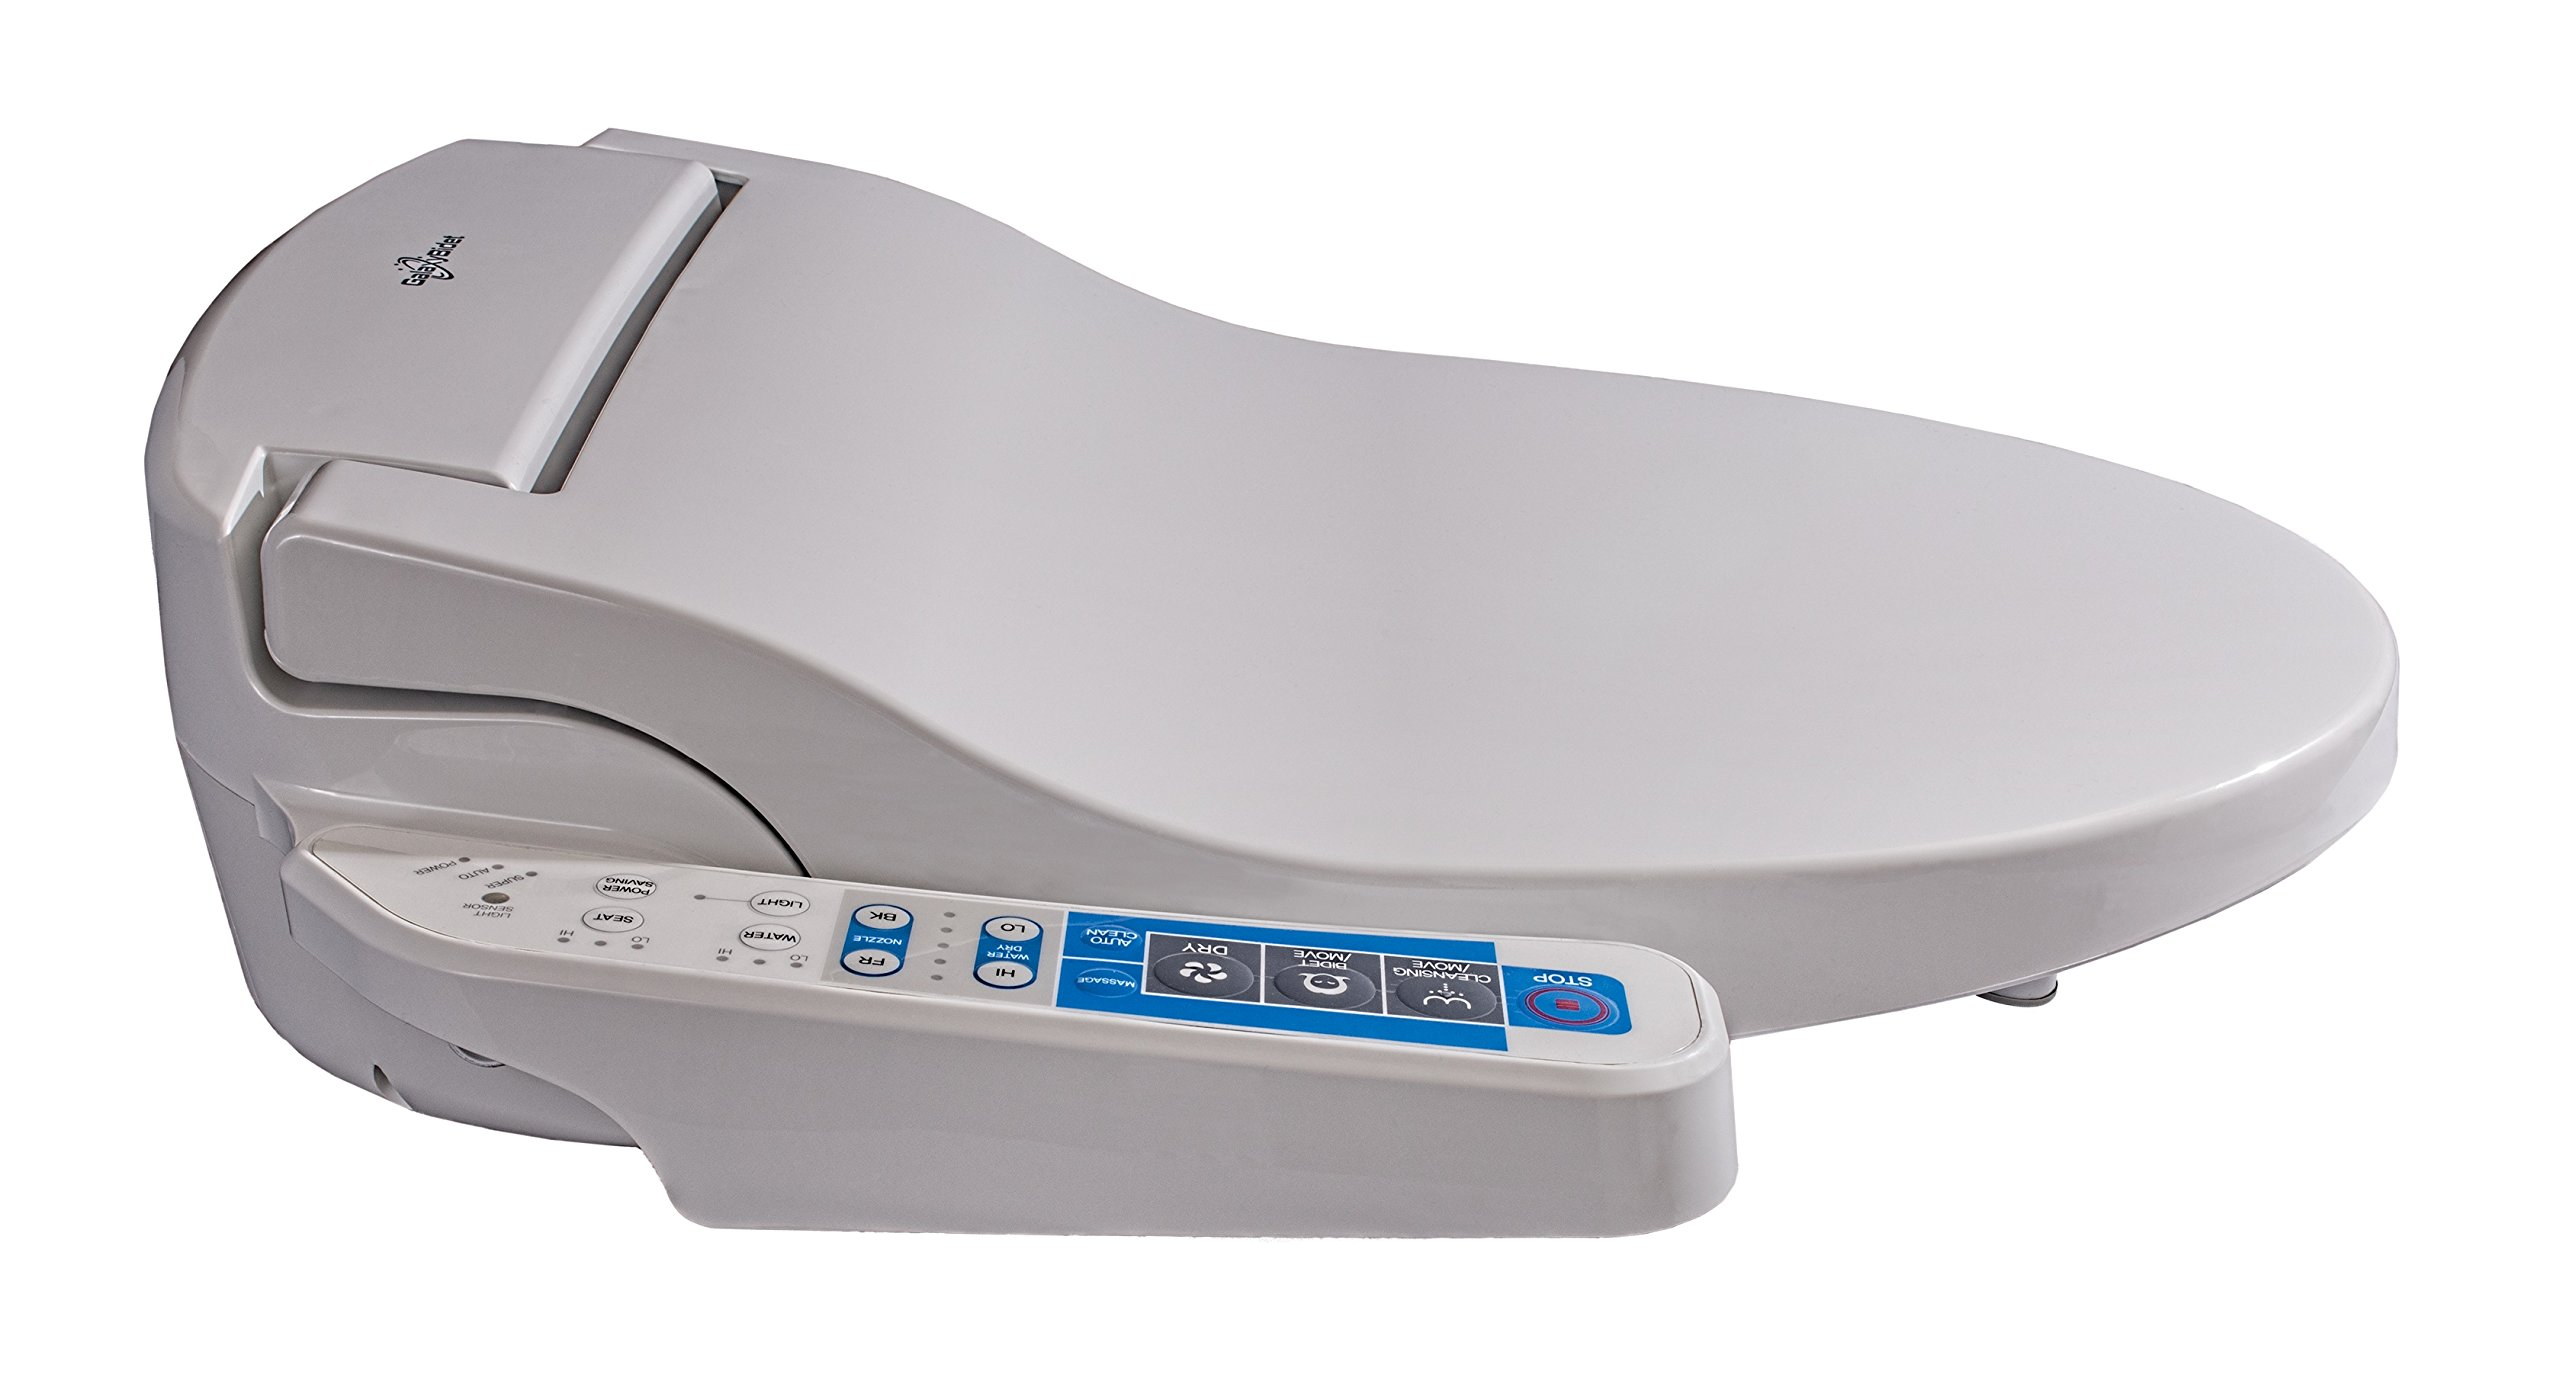 Galaxy Bidet Electronic W18.2 x D19.5 x H6.1 Inches Toilet Seat by Galaxy Bidet (Image #3)